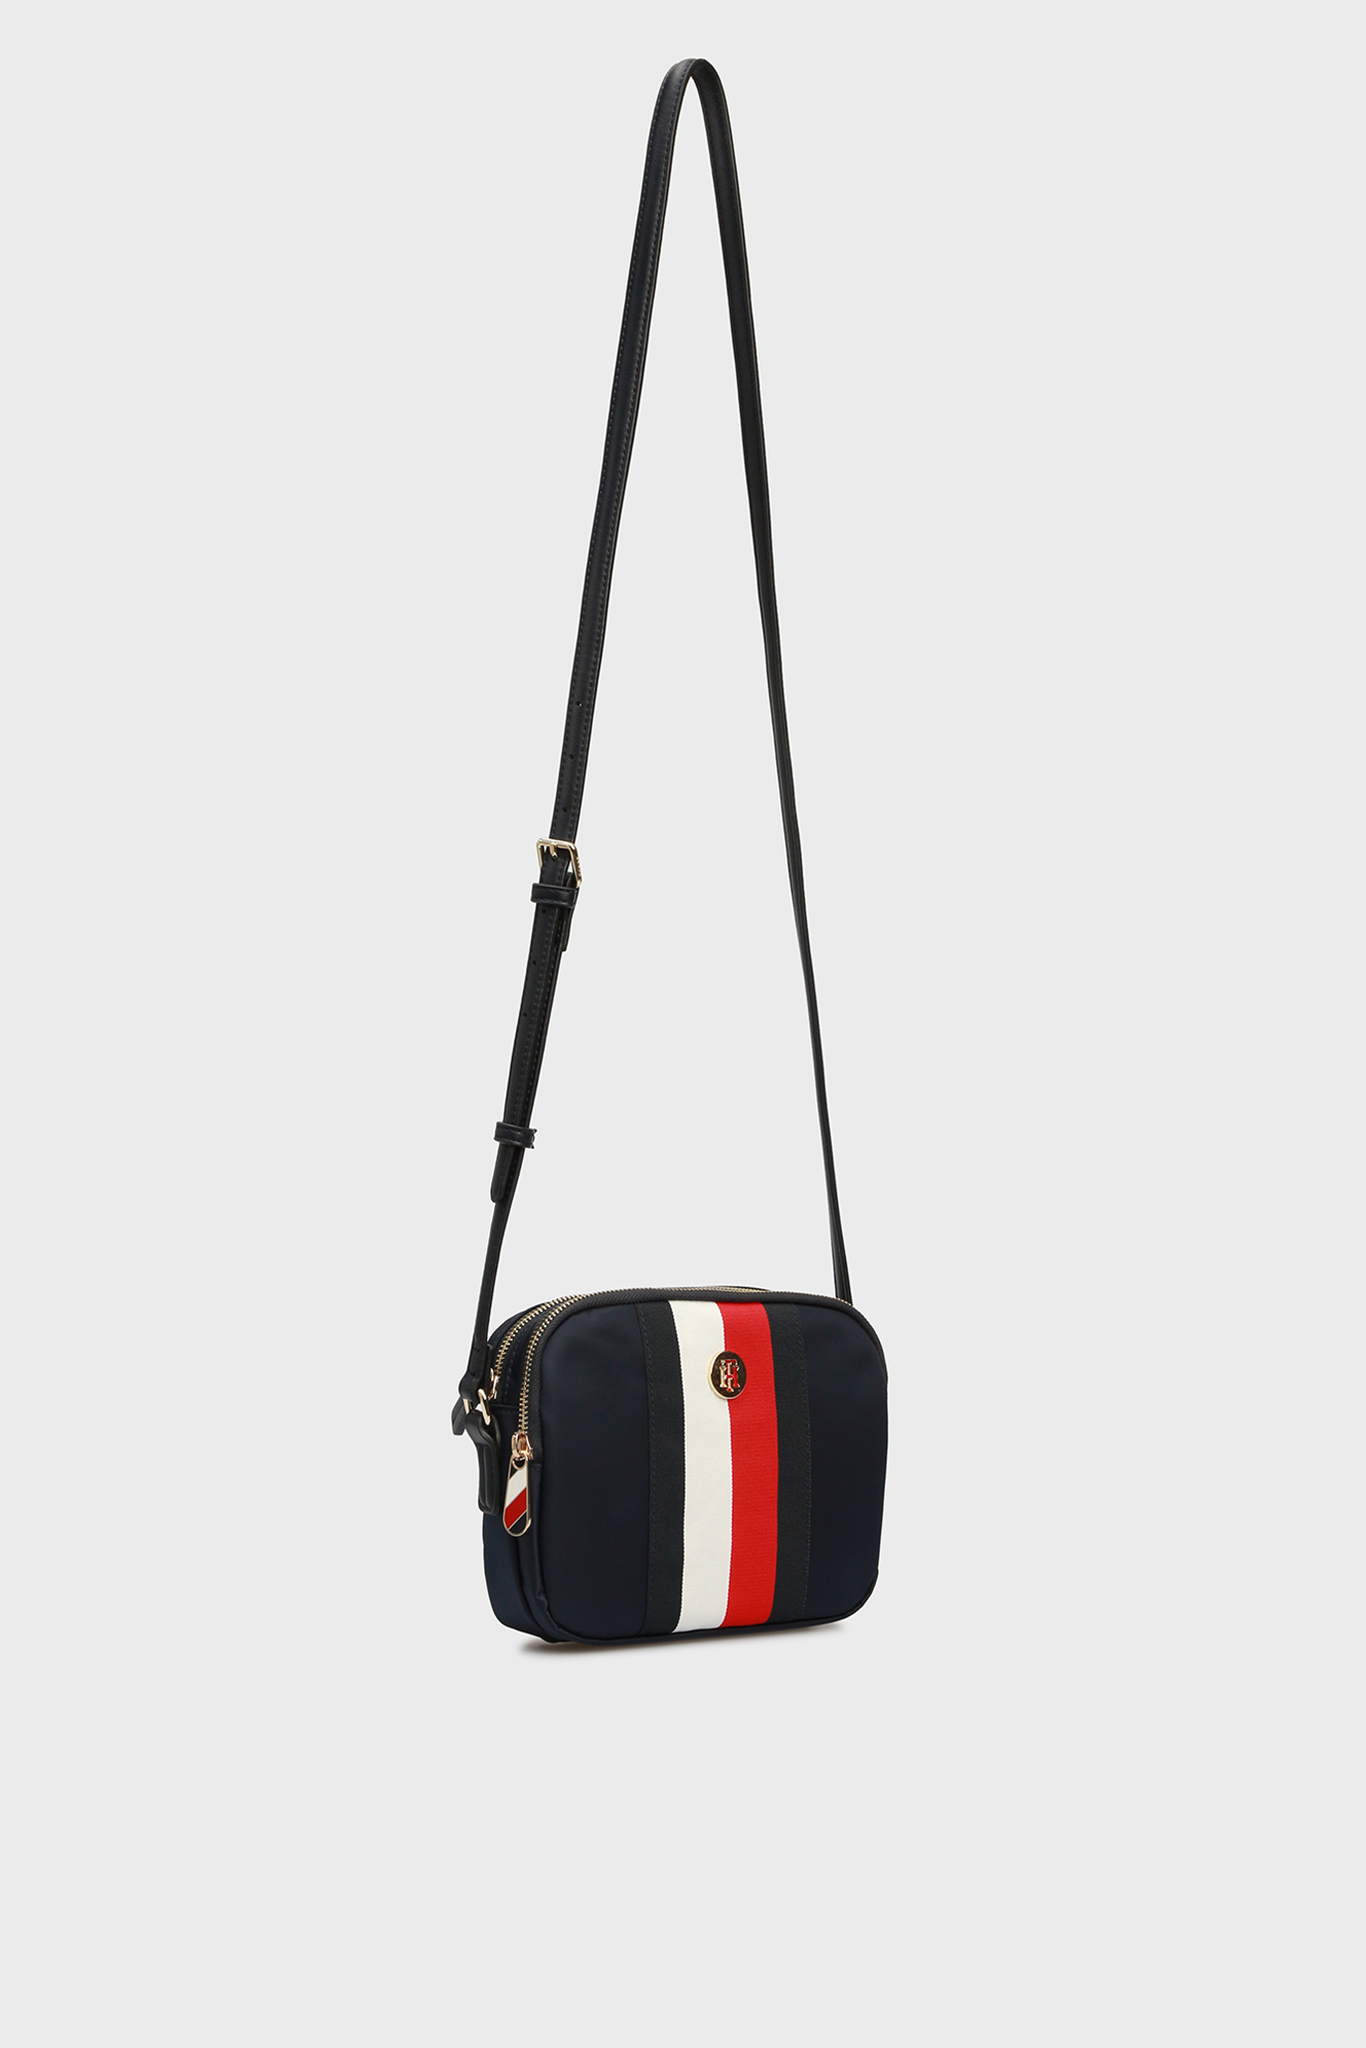 Женская темно-синяя сумка через плечо POPPY Tommy Hilfiger